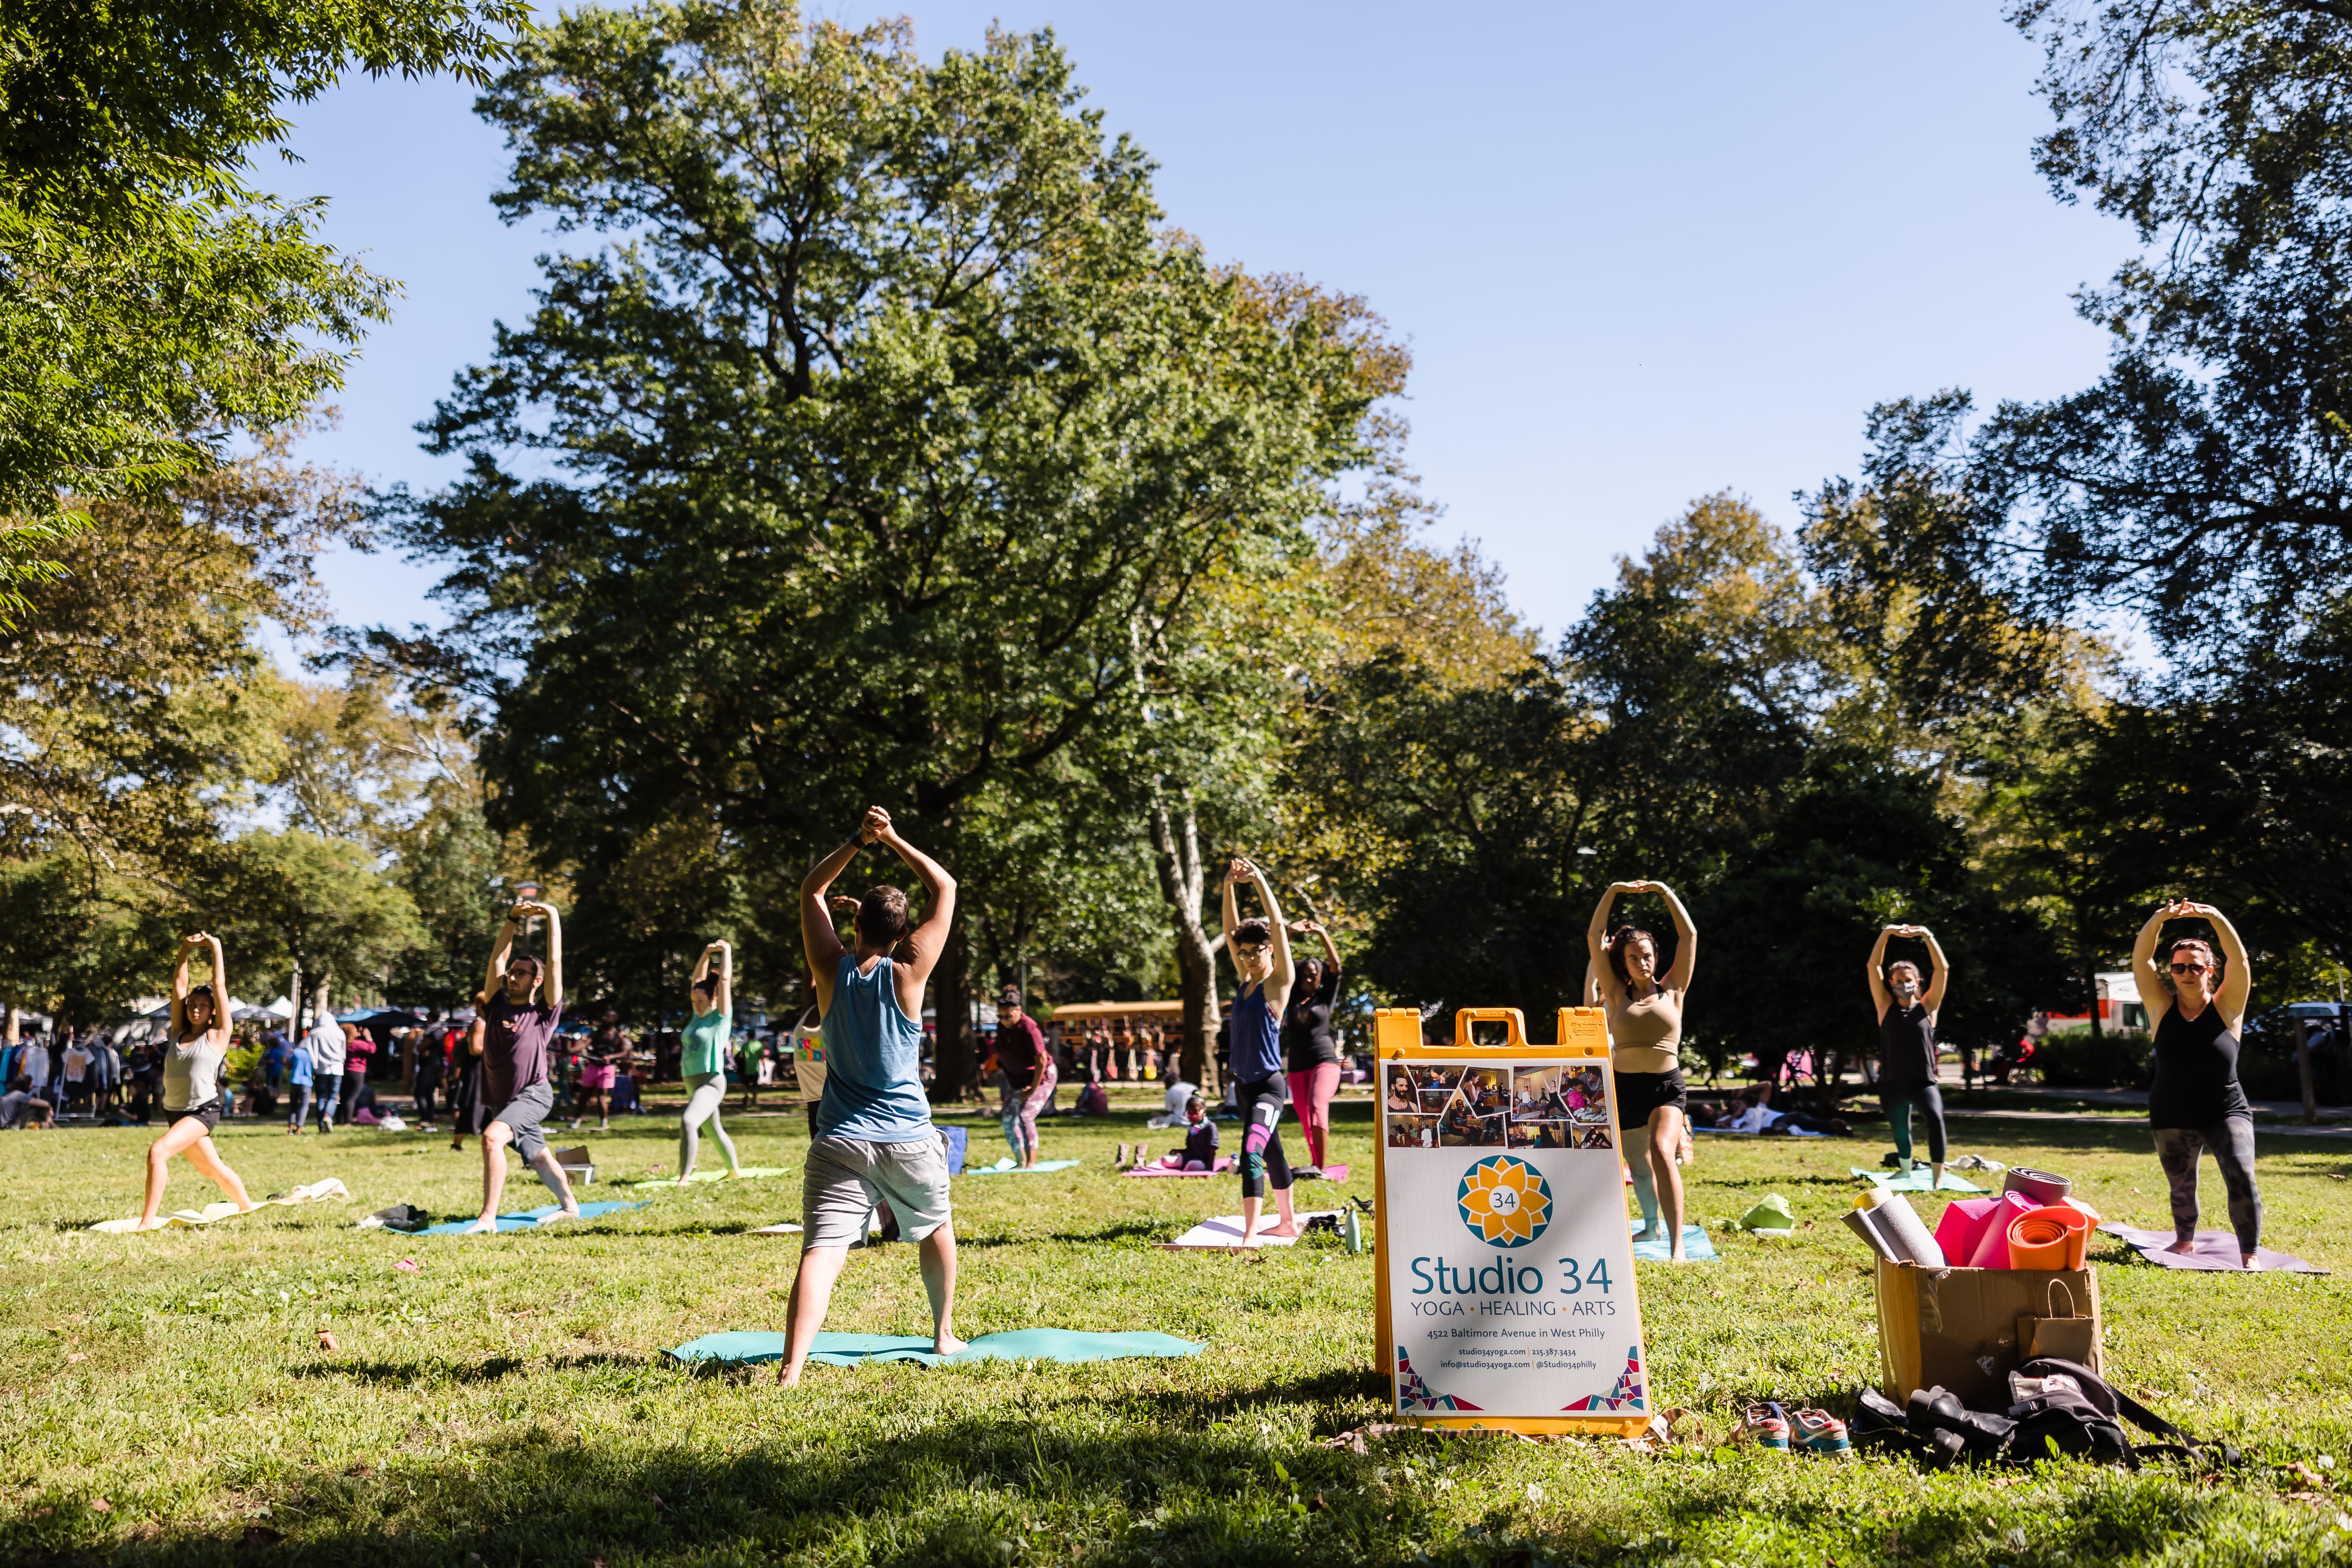 Yoga from Studio 34 in Clark Park